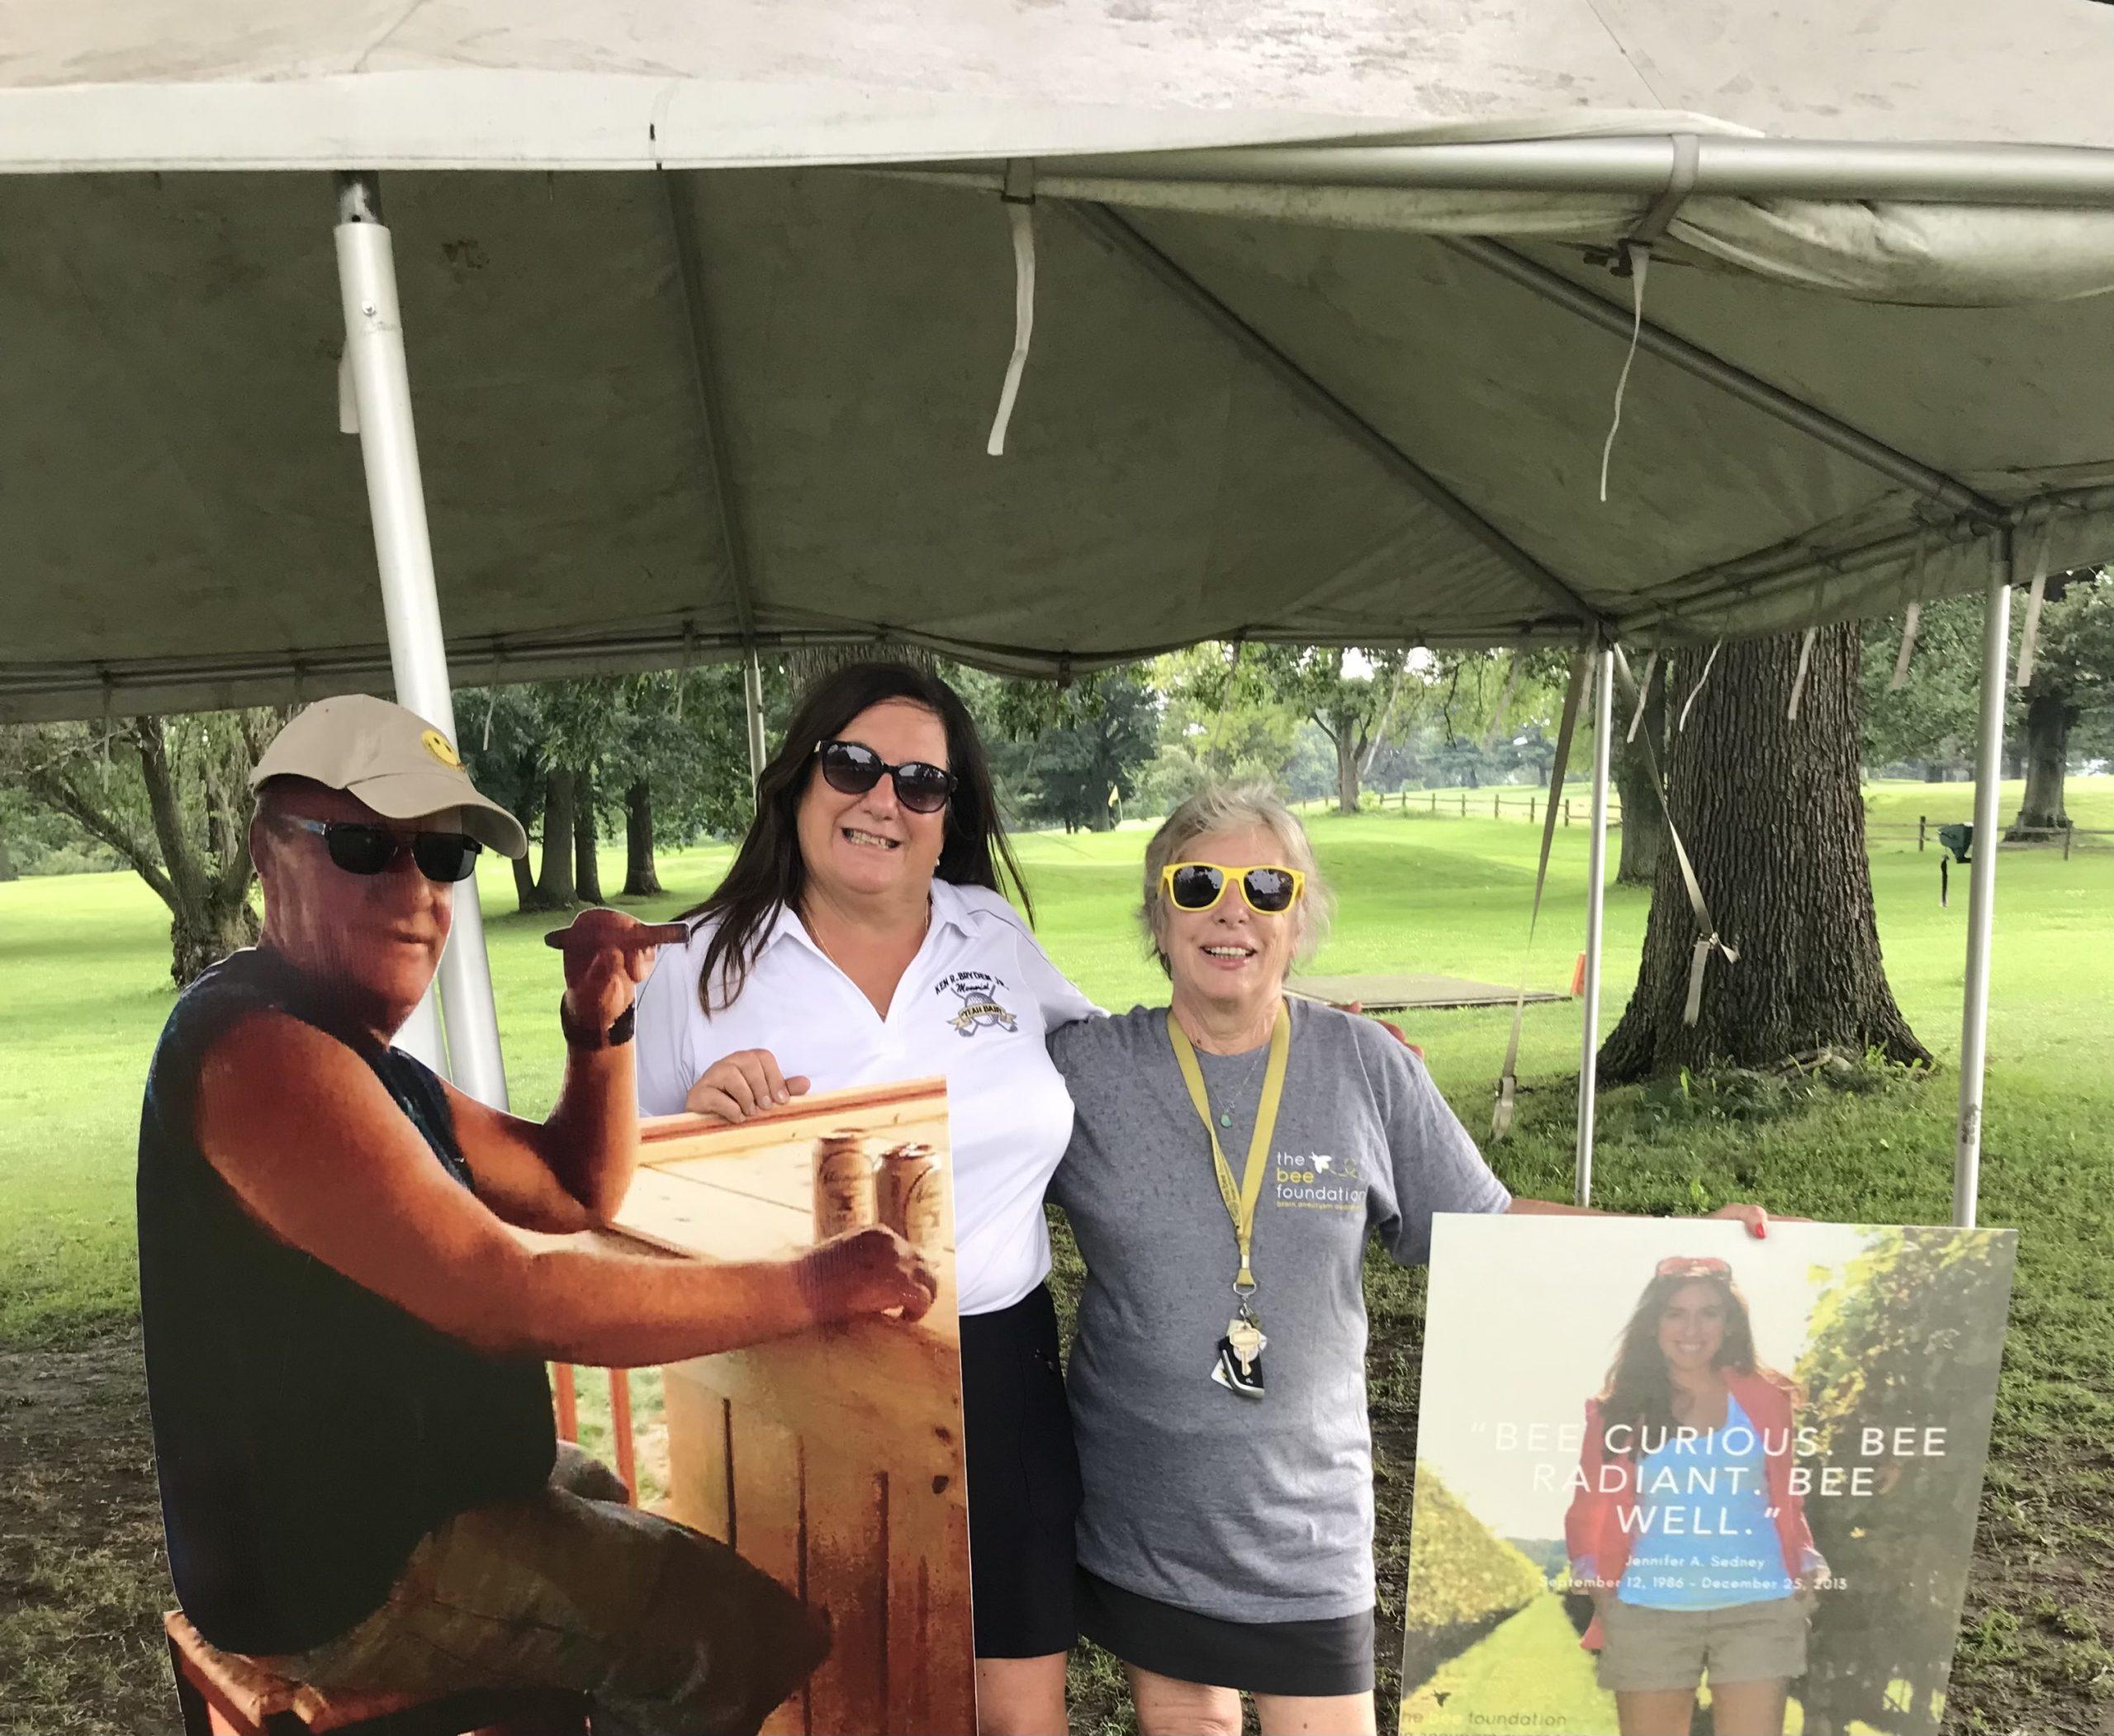 The 4th annual Kenny R. Bryden, Jr. Golf Tournament